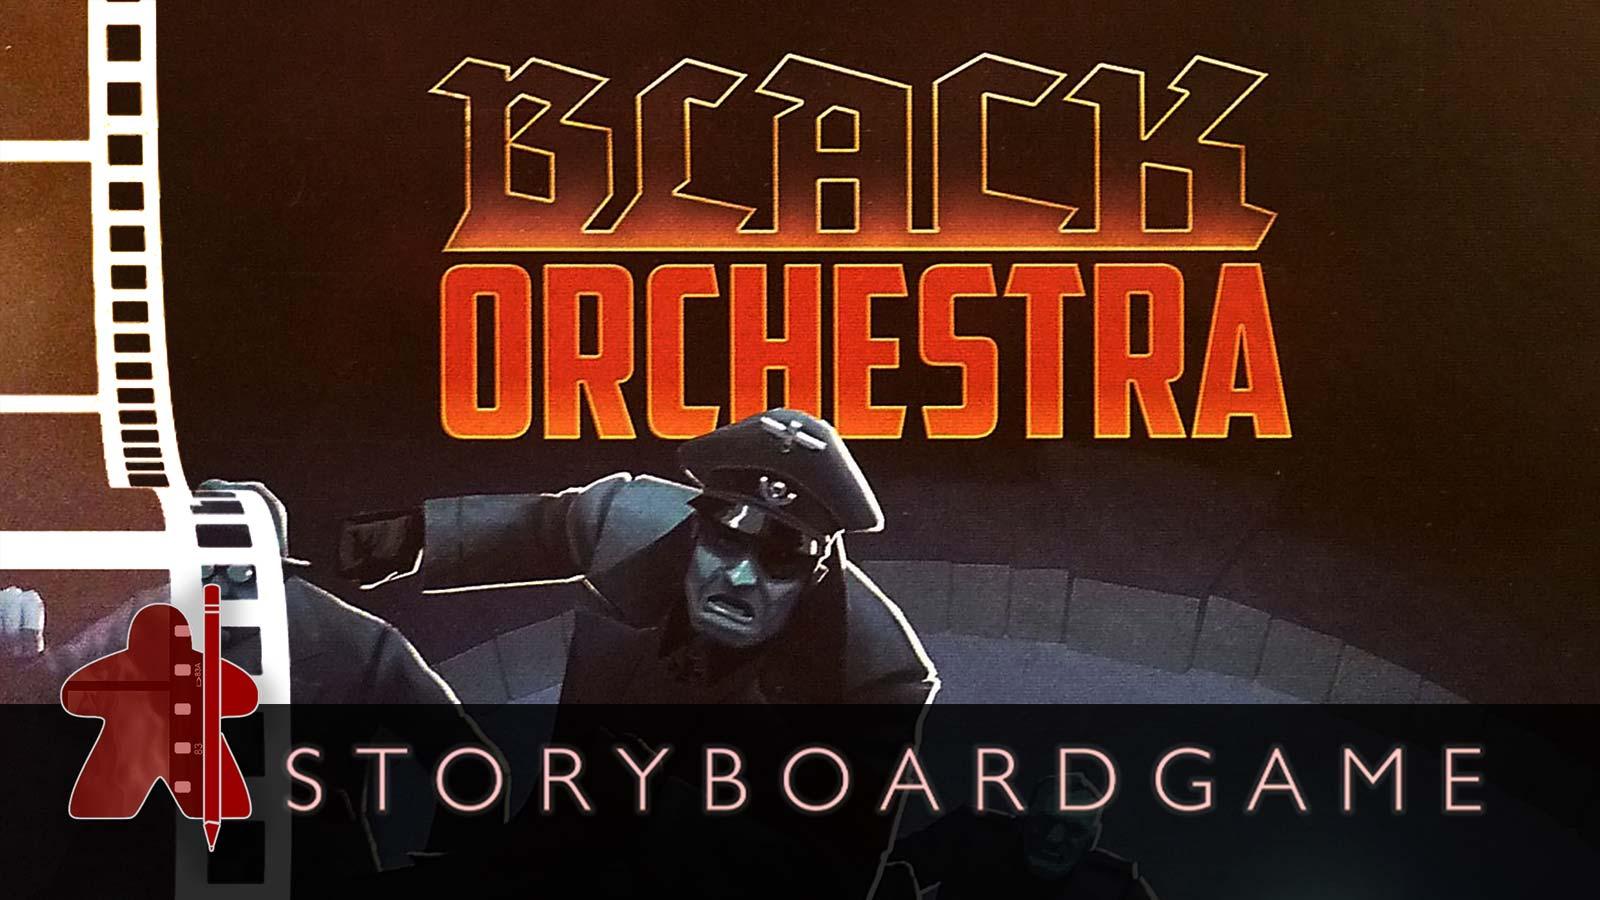 STORYBOARDGAME – BLACK ORCHESTRA